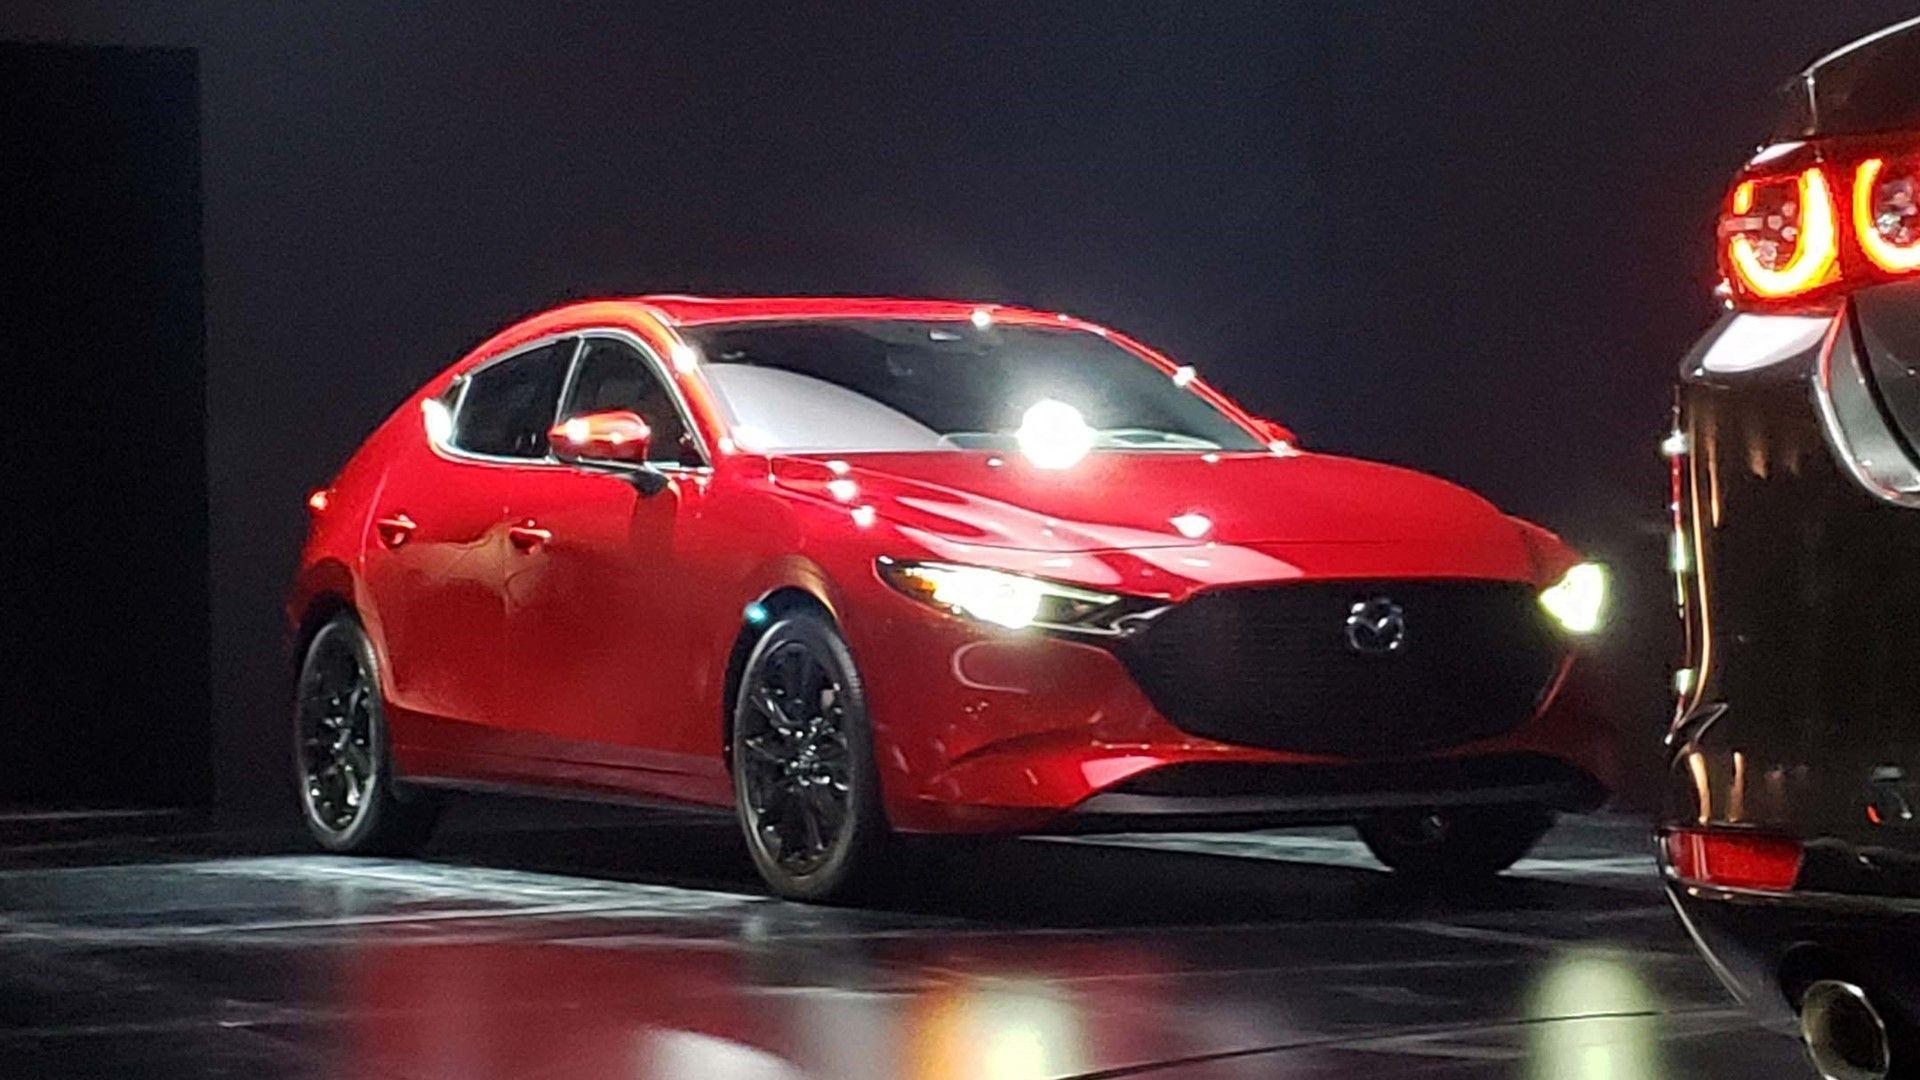 Mazda Electric Car 2020 Images Mazda Car New Cars